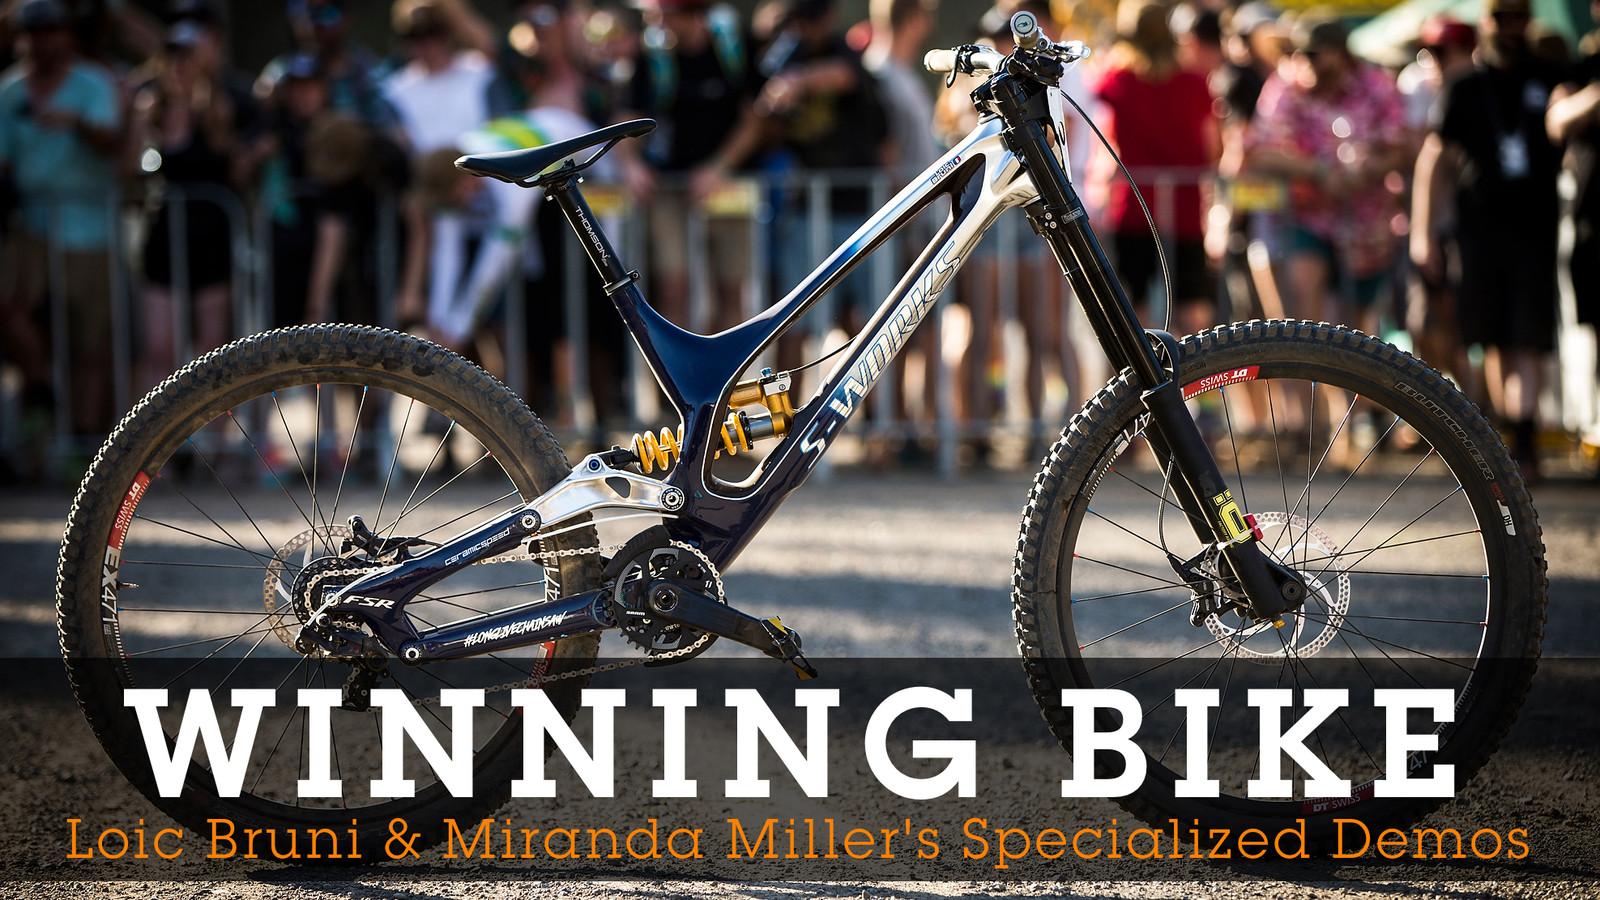 WORLD CHAMPS WINNING BIKES - Loic Bruni & Miranda Miller's Specialized Demos